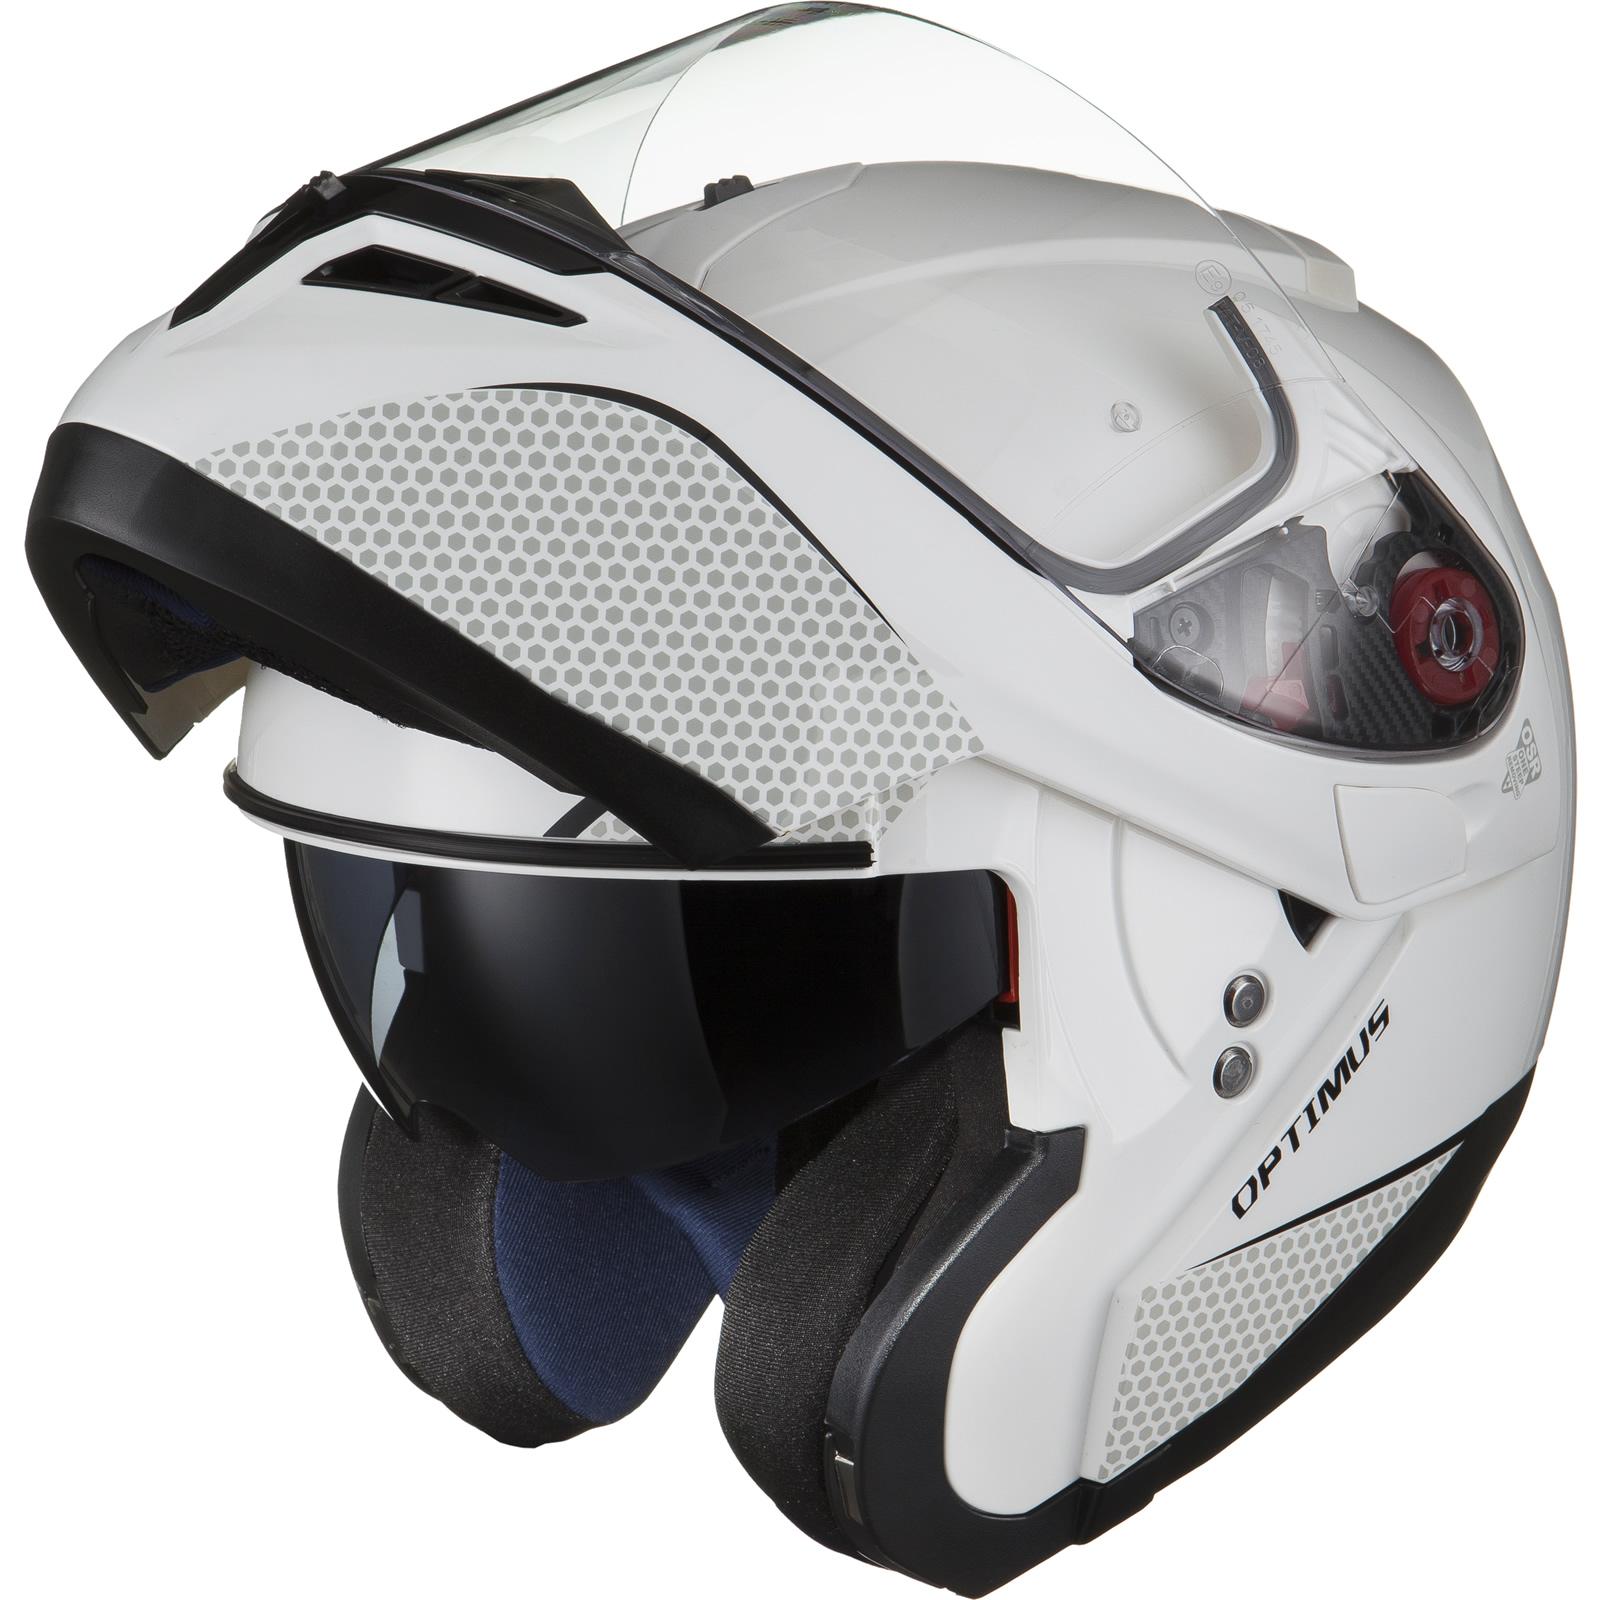 Black-Optimus-SV-Max-Vision-Flip-Up-Front-Motorcycle-Helmet-Pinlock-Ready-Visor thumbnail 30